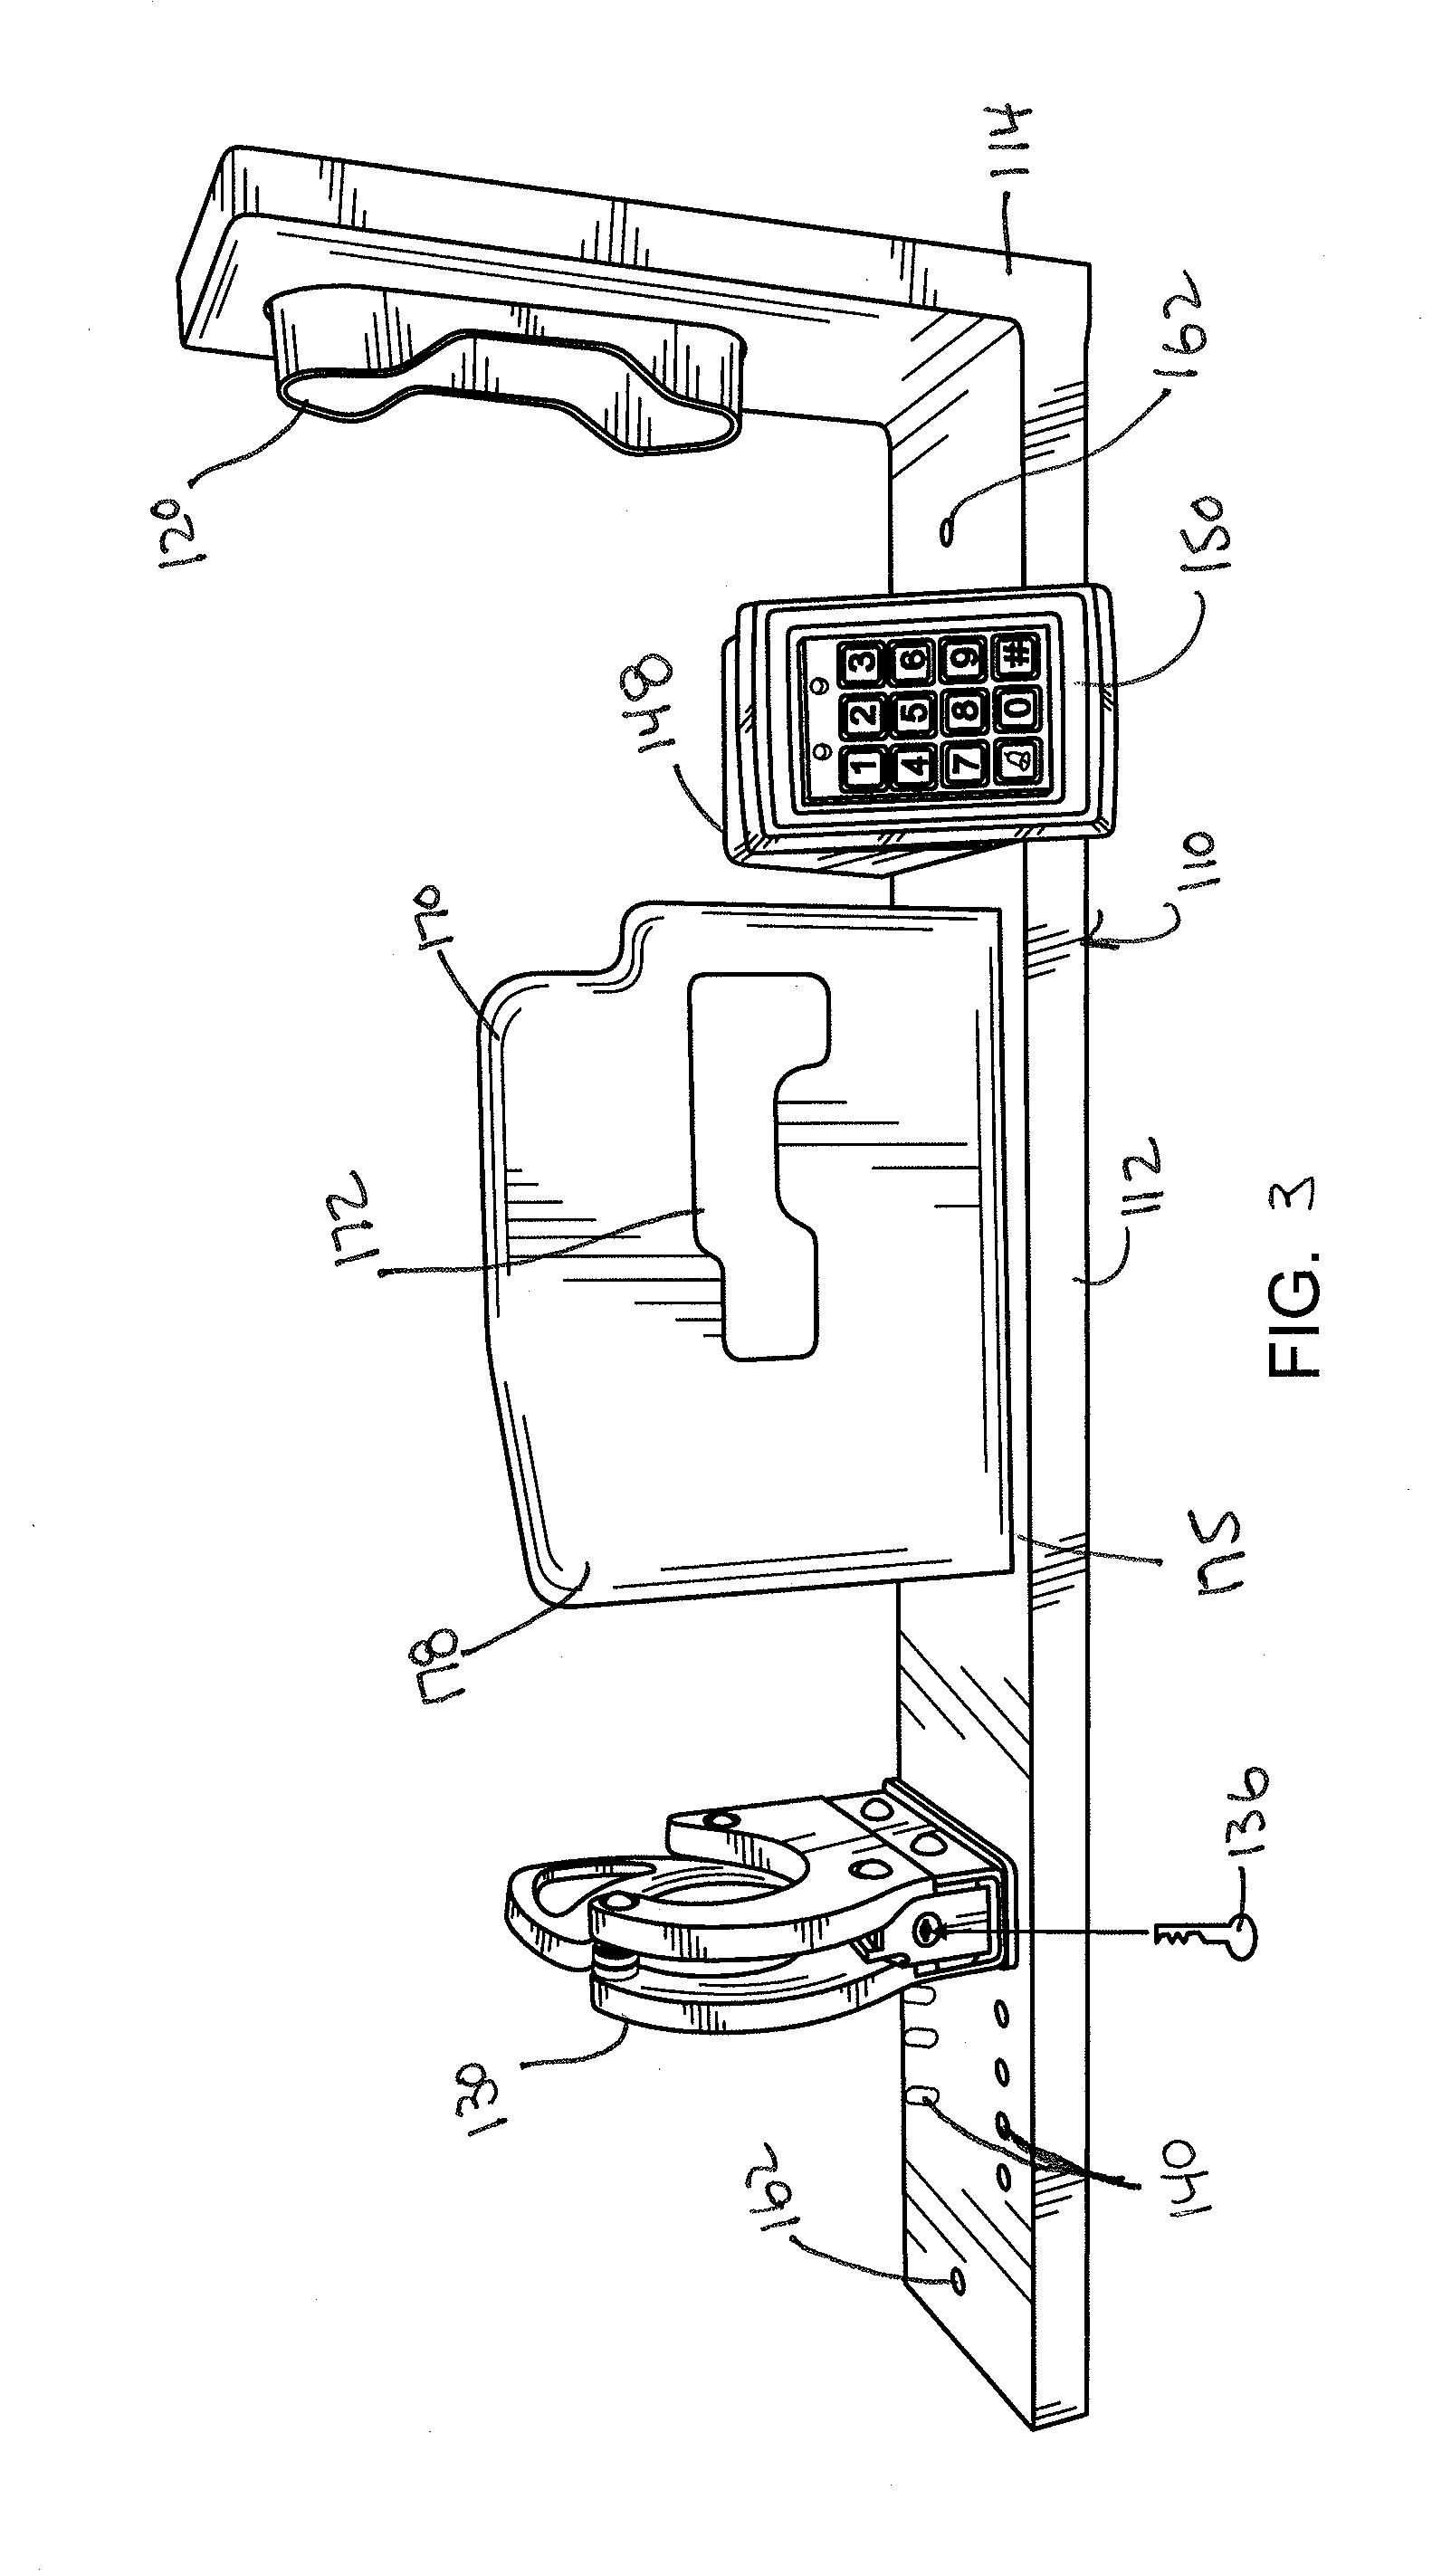 santa cruz gun lock wiring diagram   34 wiring diagram